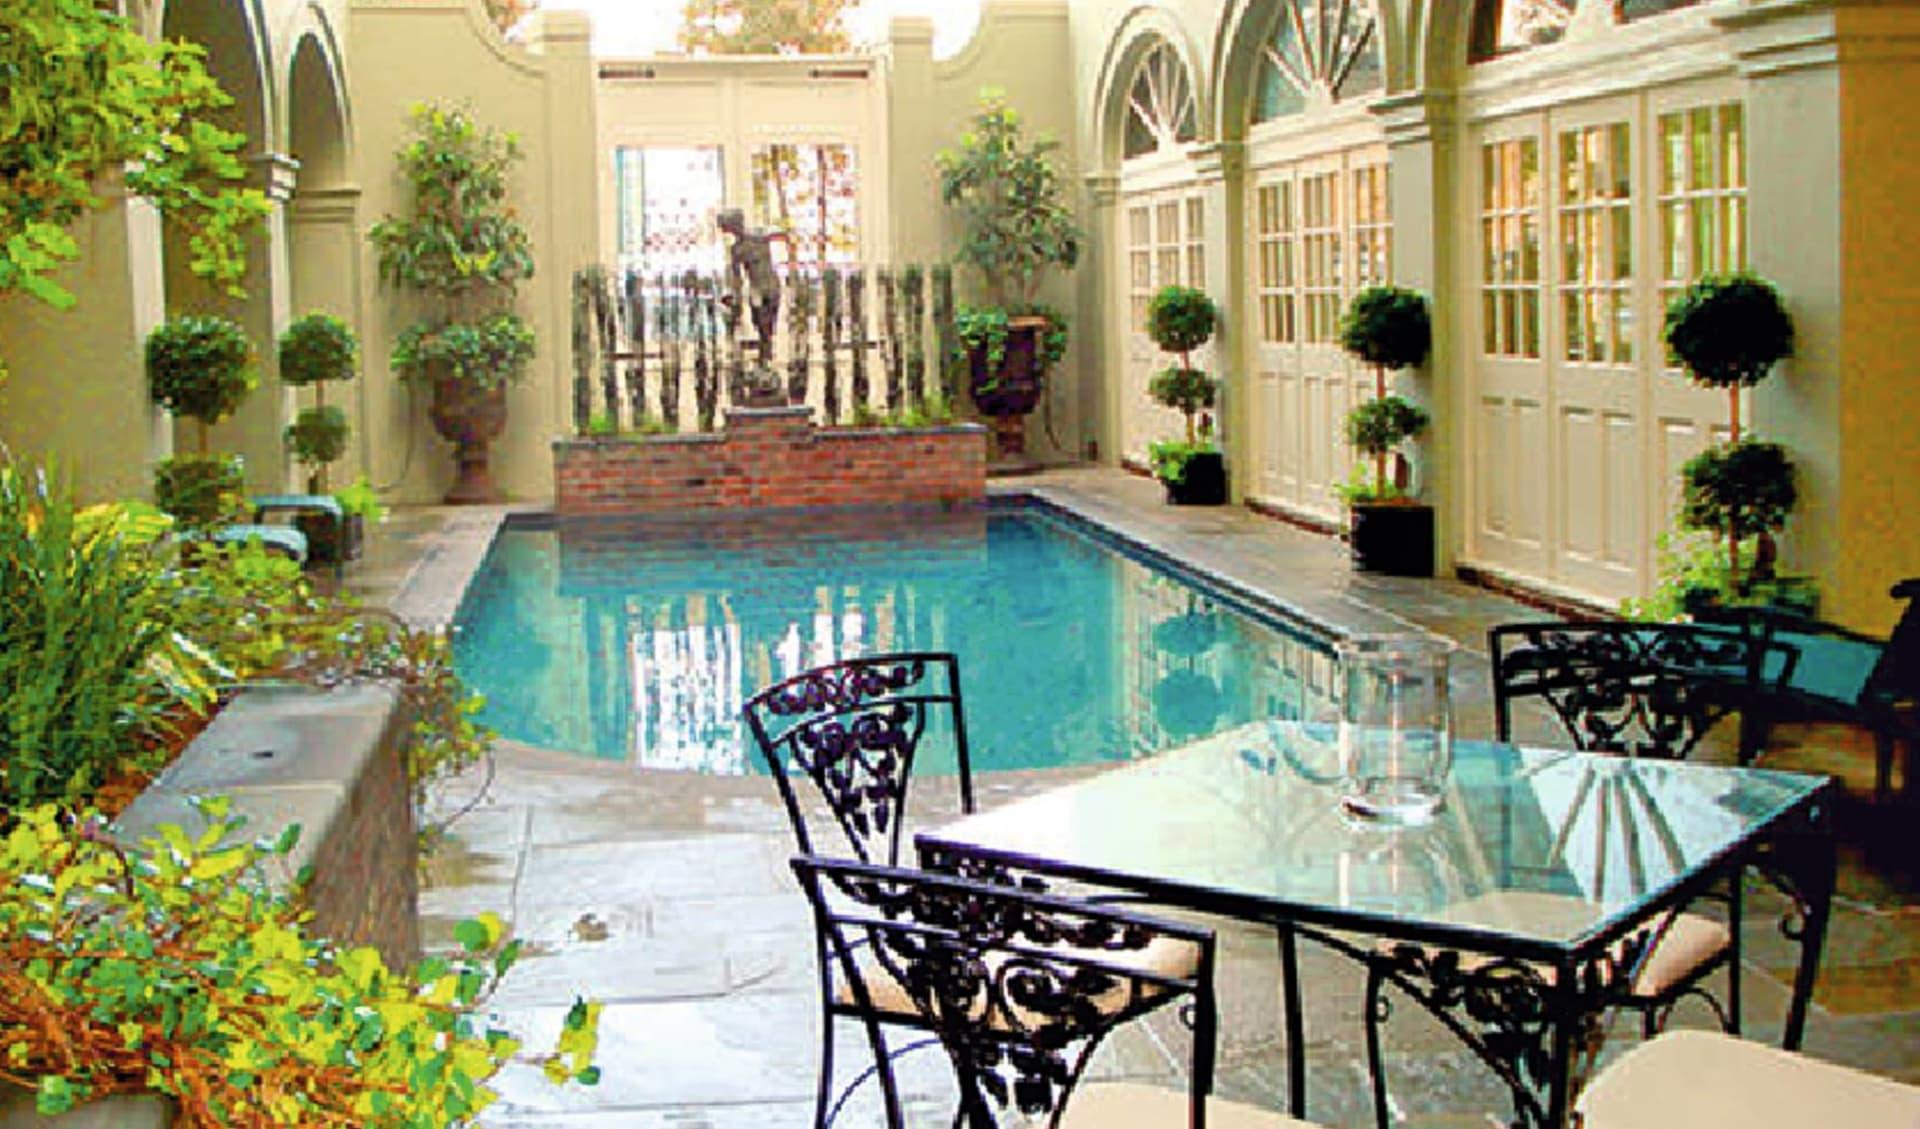 Bienville House in New Orleans:  Bienville House - Gartenanlage